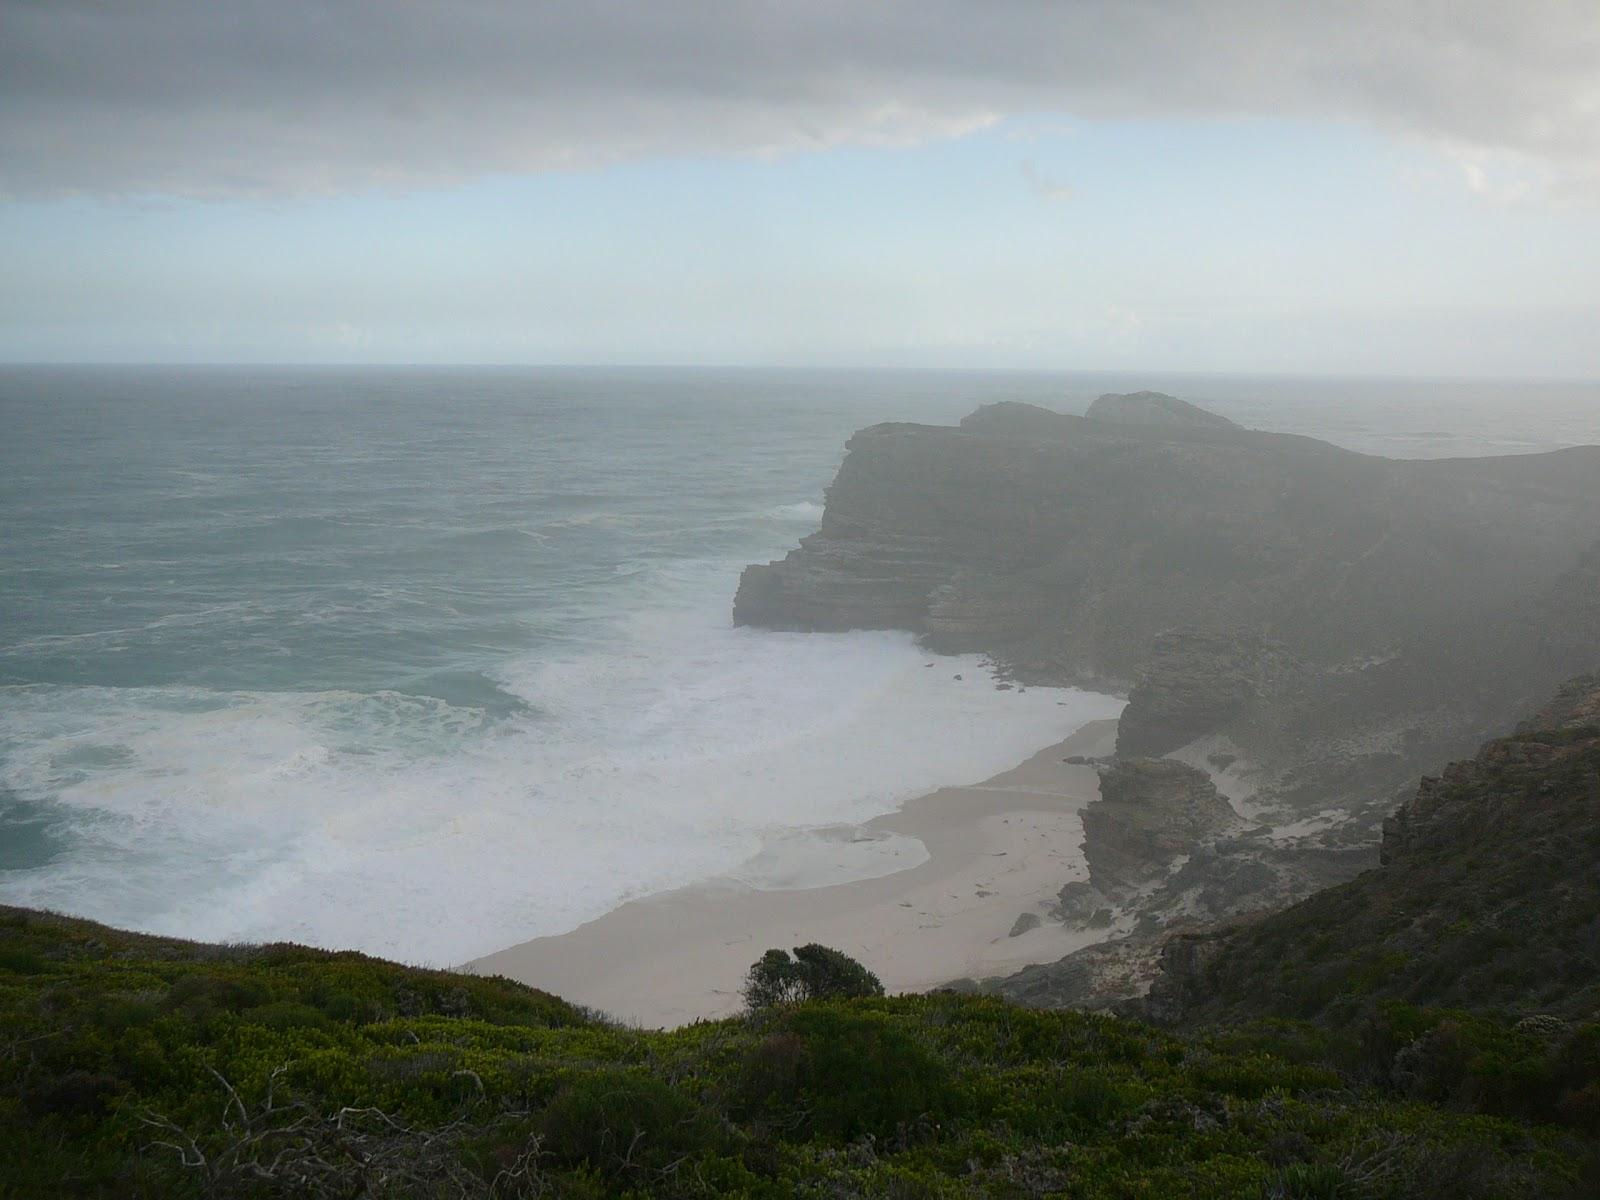 мыс доброй надежды юар кейптаун cape of good hope